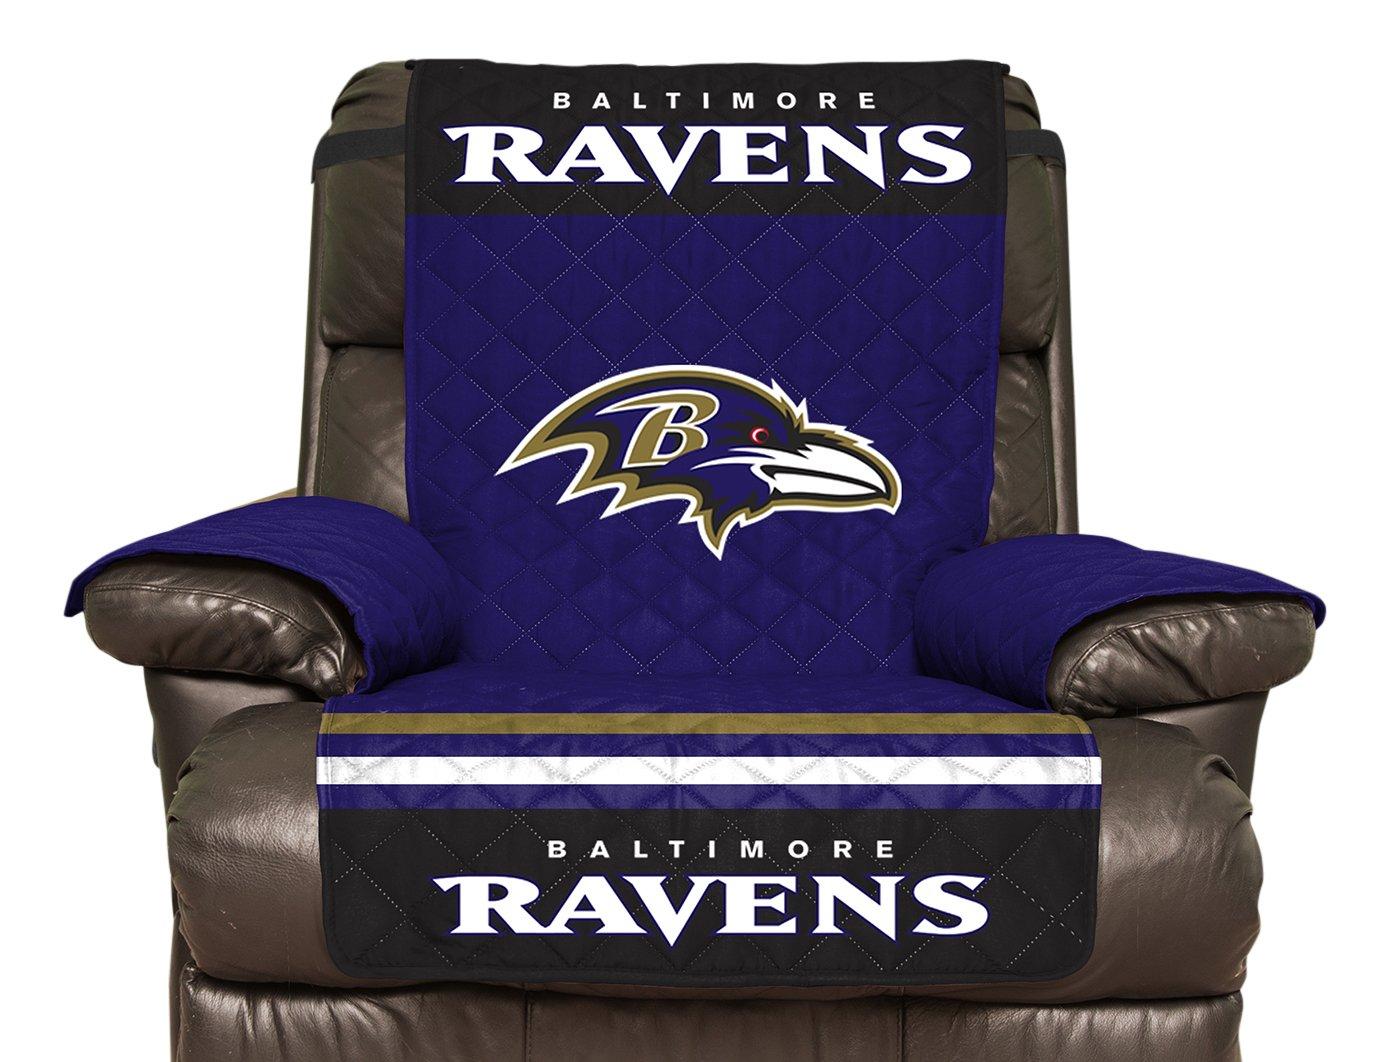 Pegasus Sports NFL Baltimore Ravens Recliner Reversible Furniture Protector with Elastic Straps, 80-inches by 65-inches by Pegasus Sports